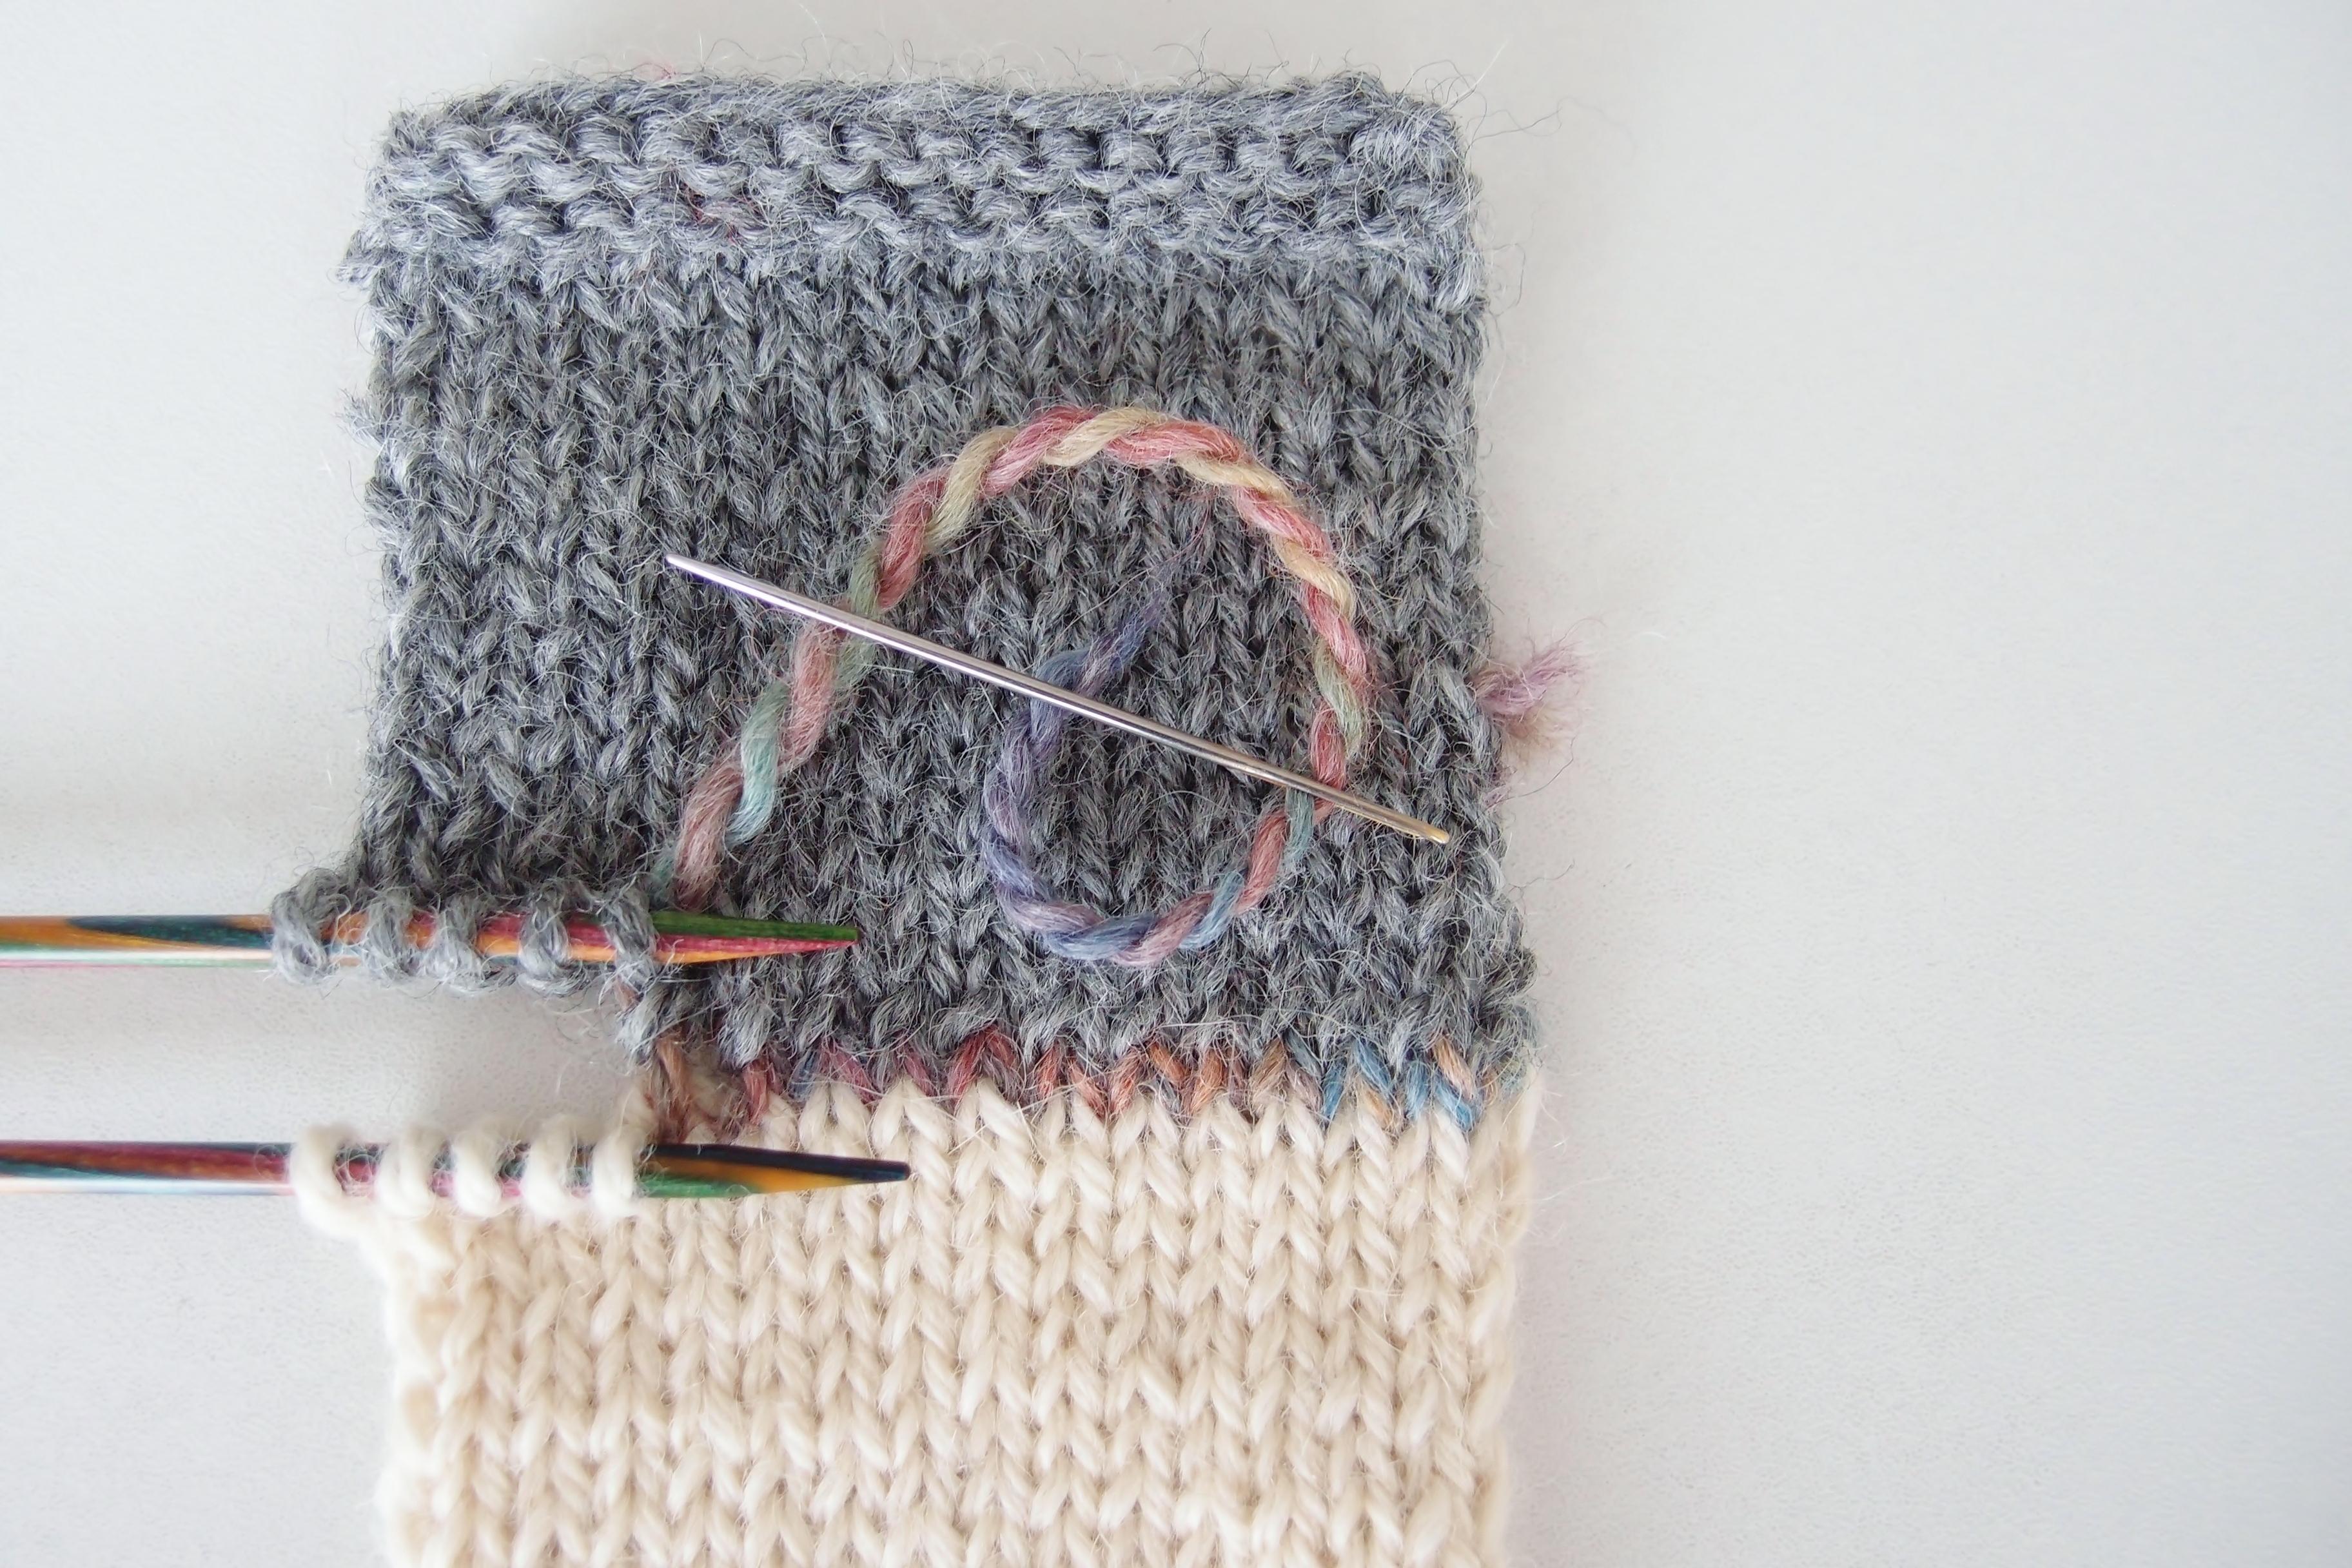 Kitchener Stitch (メリヤスはぎ) を正しく行うための私なりの方法